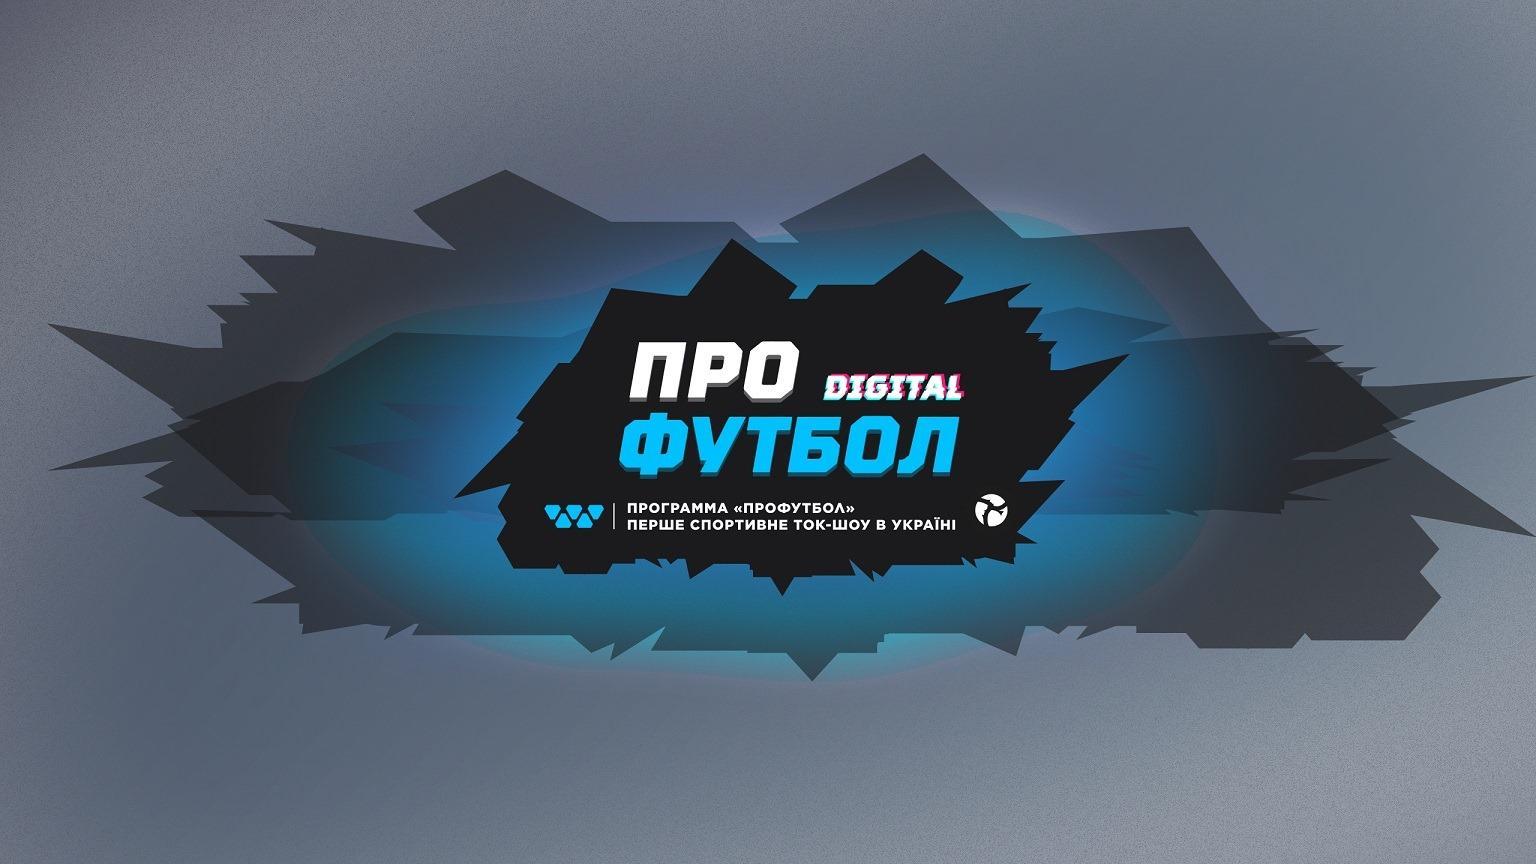 https://telekritika.ua/tk-static/2020/10/profutbol-plyusy-04-10-2020.jpg